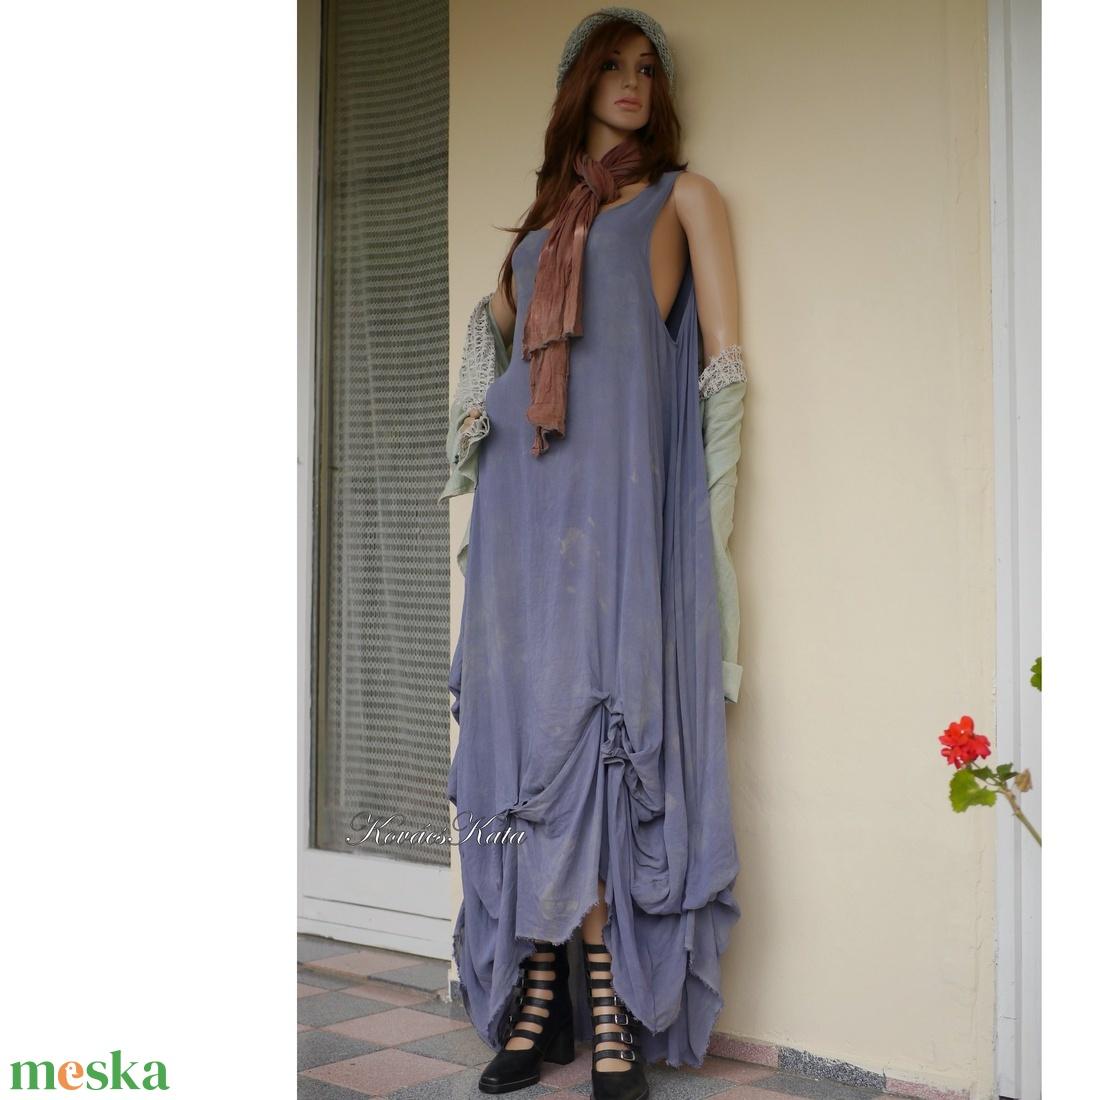 KIM / szürke zsorzsett - lagenlook design ruha XXL - ruha & divat - női ruha - ruha - Meska.hu